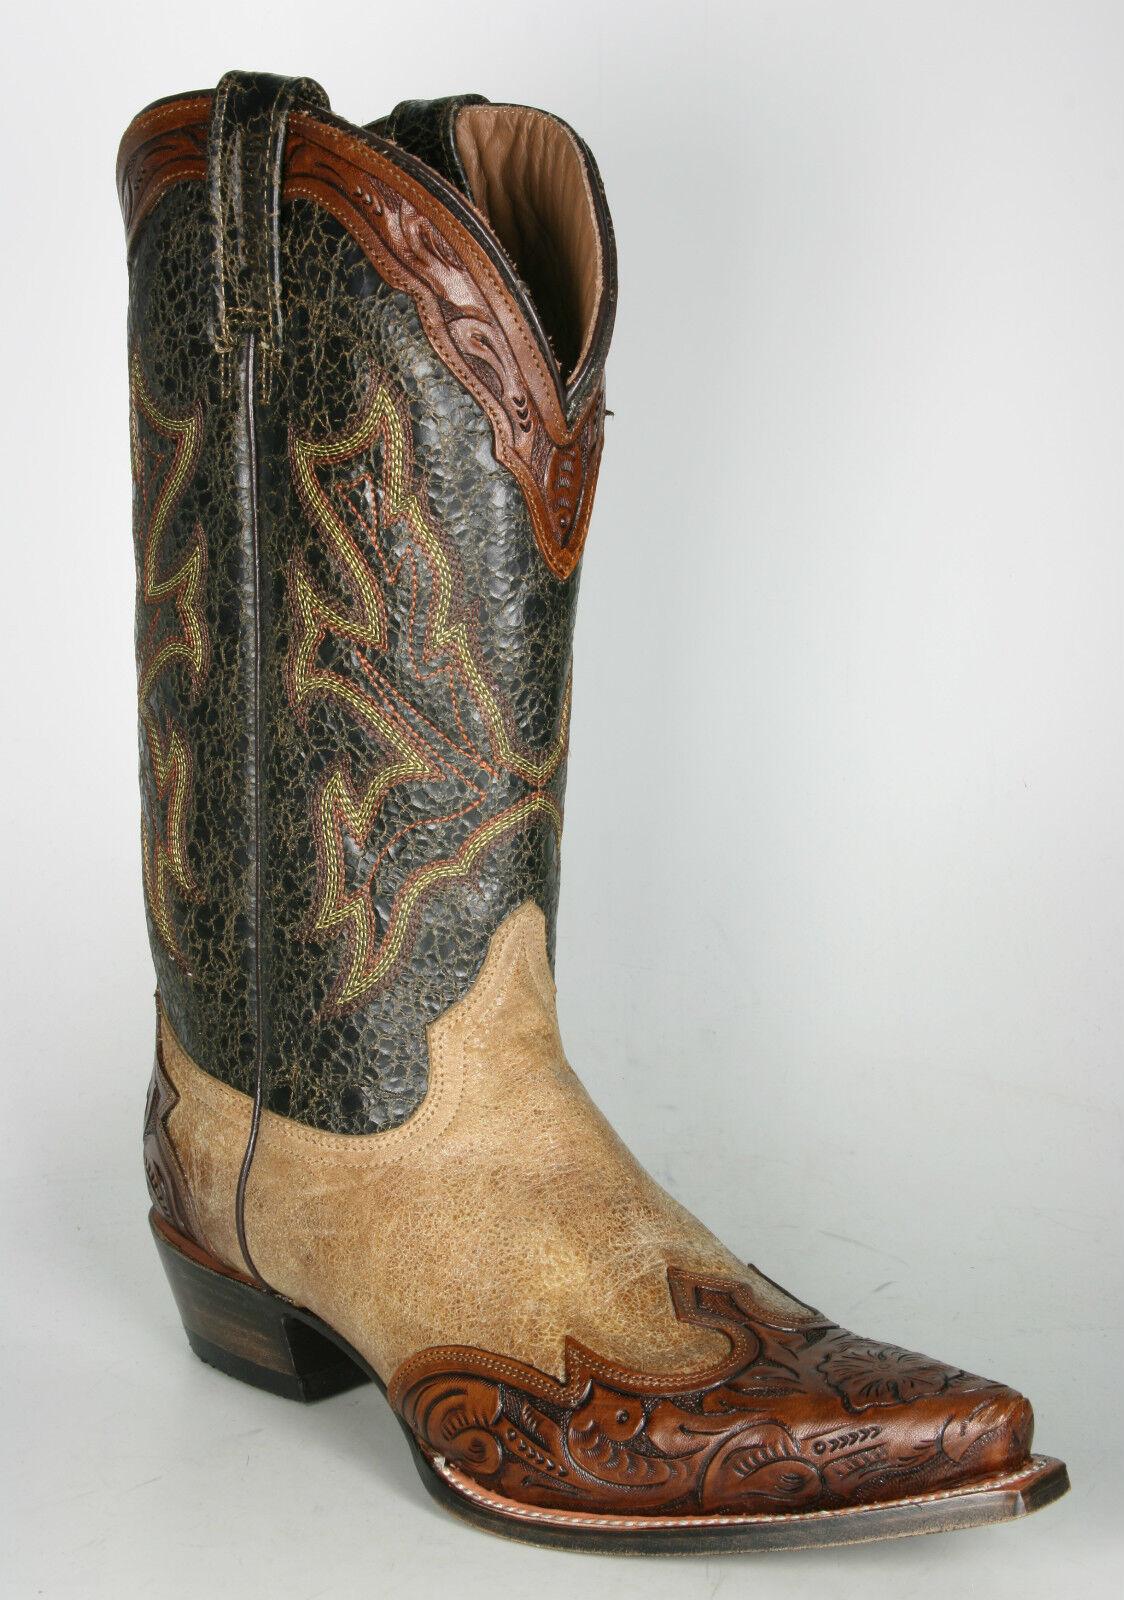 140029000 Mezcalero Cowboystiefel Crater Gold Punziertes Leder Handmade